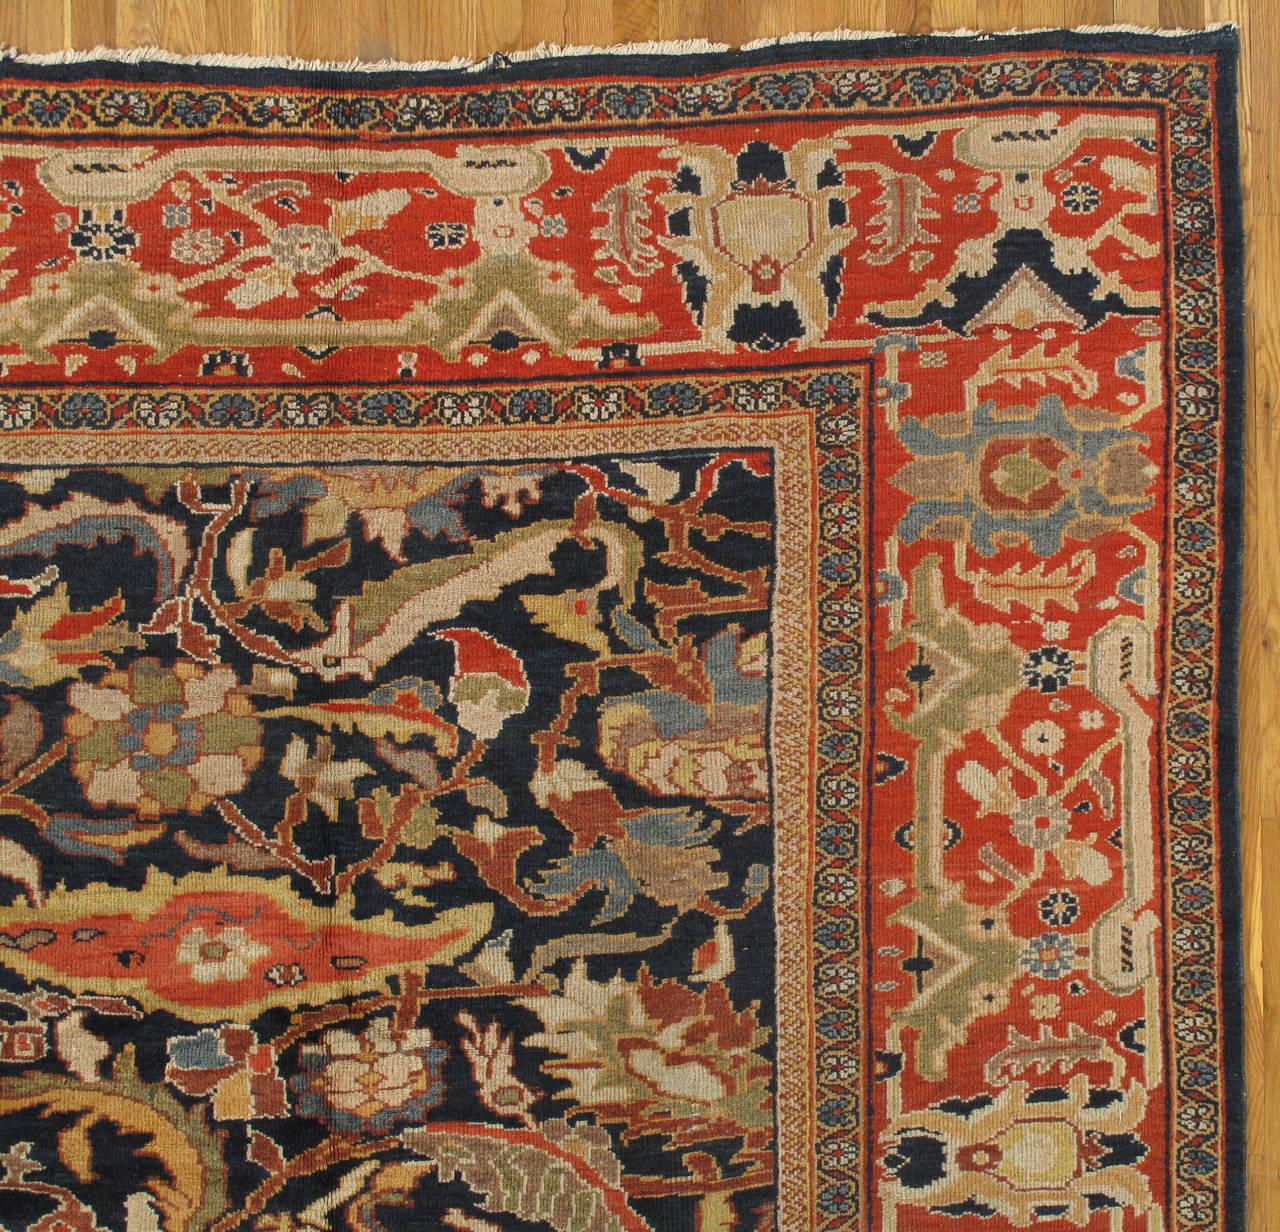 Antique Persian Sultanabad Carpet Handmade Oriental Rug Navy Blue Rust Gold